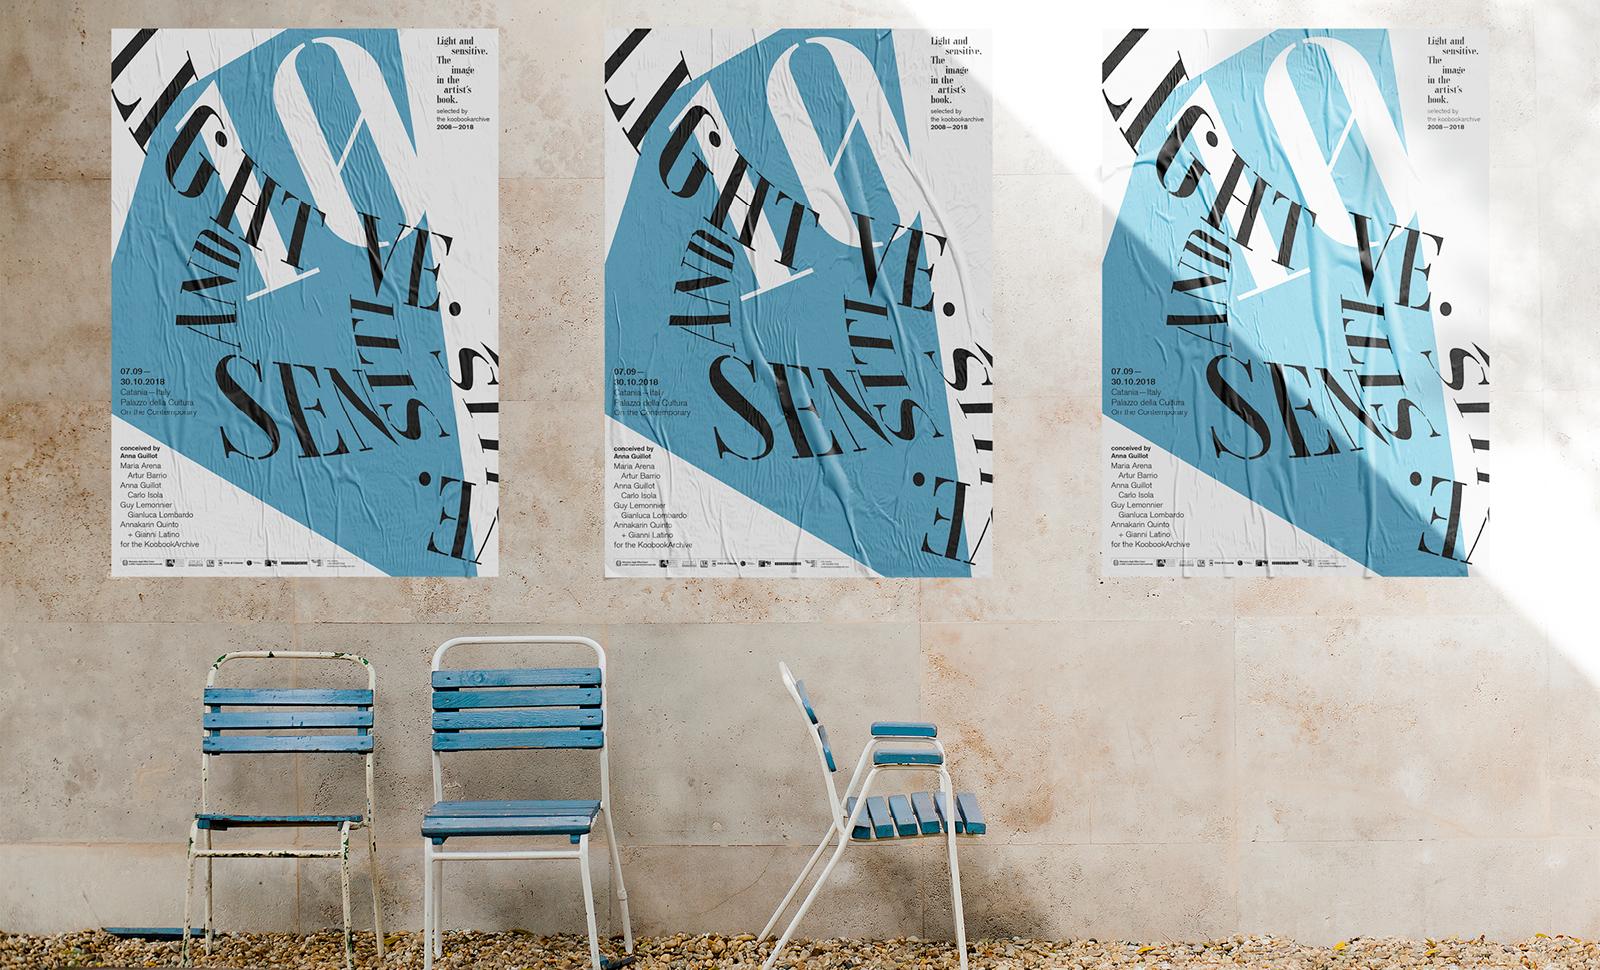 gianni latino, poster istituzionale, formato 67x97 mm, stampa offset, 2018.